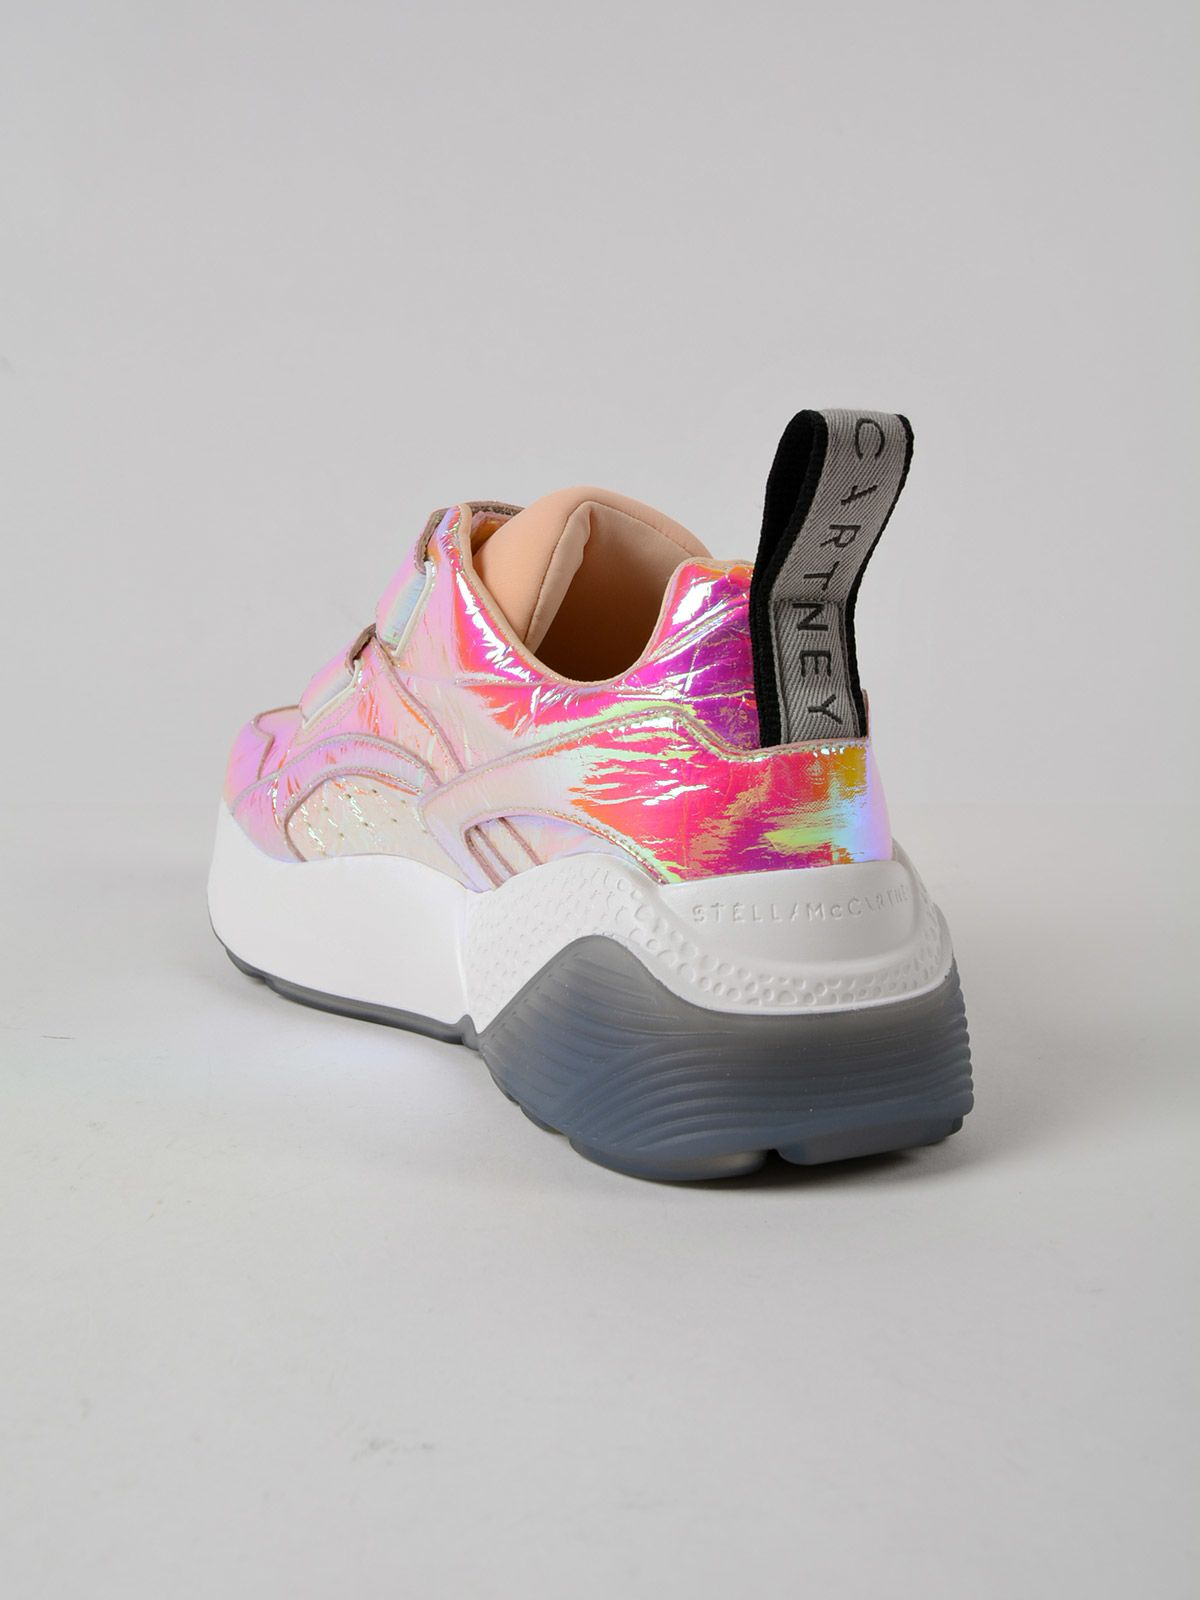 Strap Sneakers Metallic Stella McCartney xpd7VXokNF